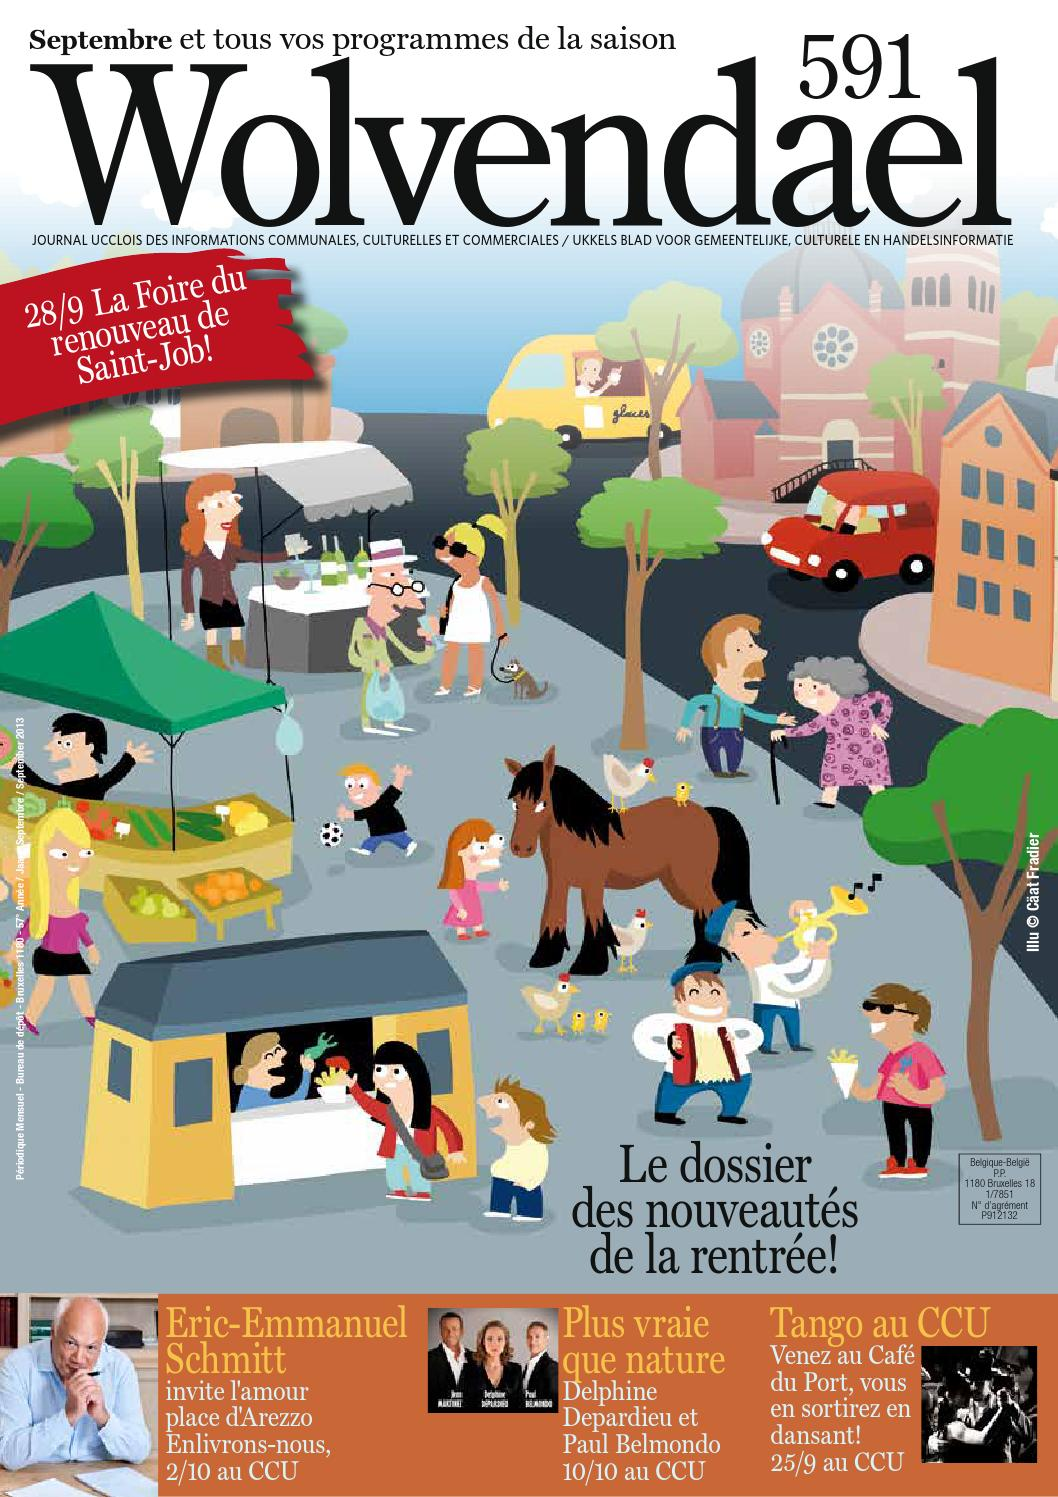 Wolvendael magazine n°591 septembre 2013 by Centre Culturel d Uccle - issuu eccfc81ddd2